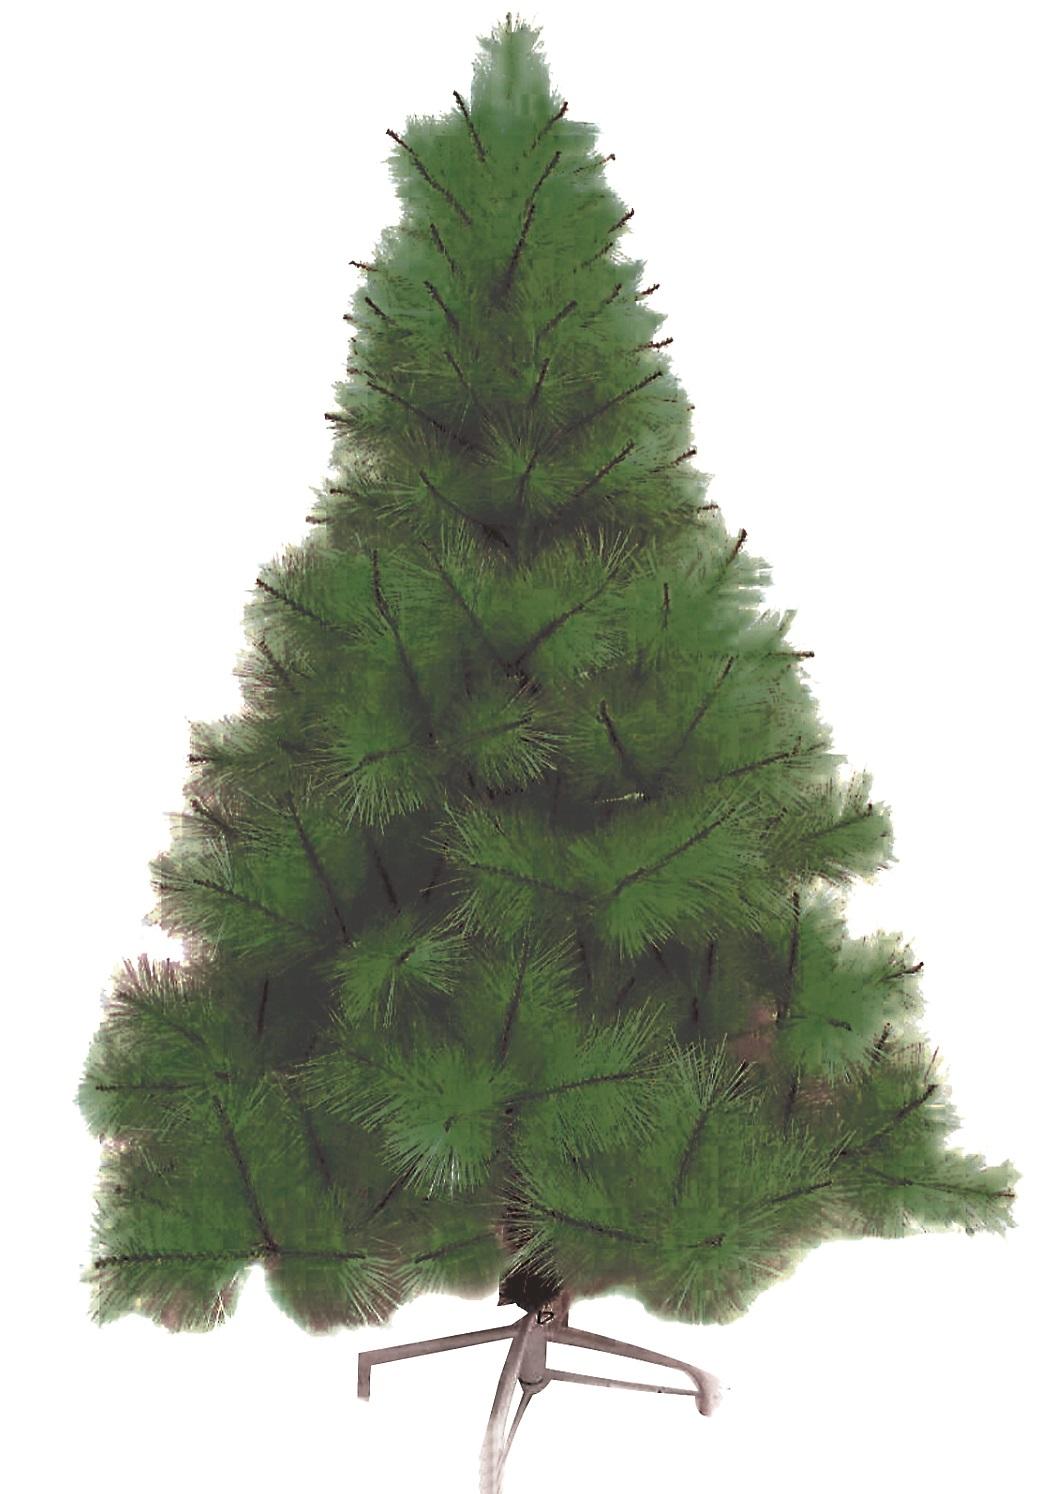 X射線【X021426】4尺聖誕松針樹(綠)(不含飾品、燈飾),聖誕樹/聖誕佈置/聖誕空樹/聖誕造景